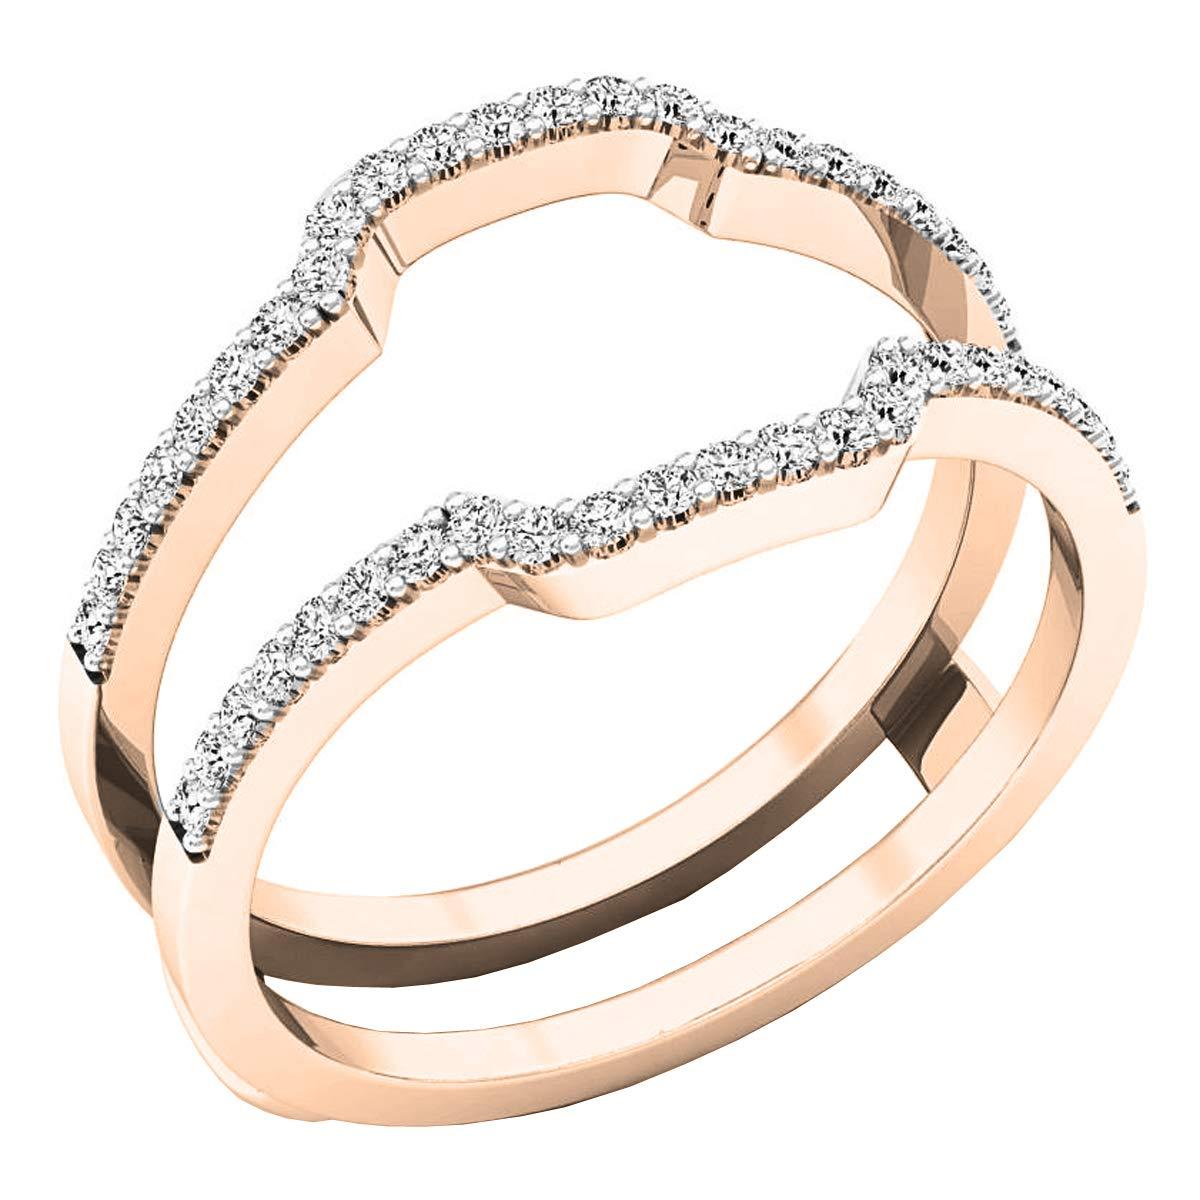 Dazzlingrock Collection 0.25 Carat (ctw) 14K Round Diamond Wedding Band Enhancer Guard Ring 1/4 CT, Rose Gold, Size 5